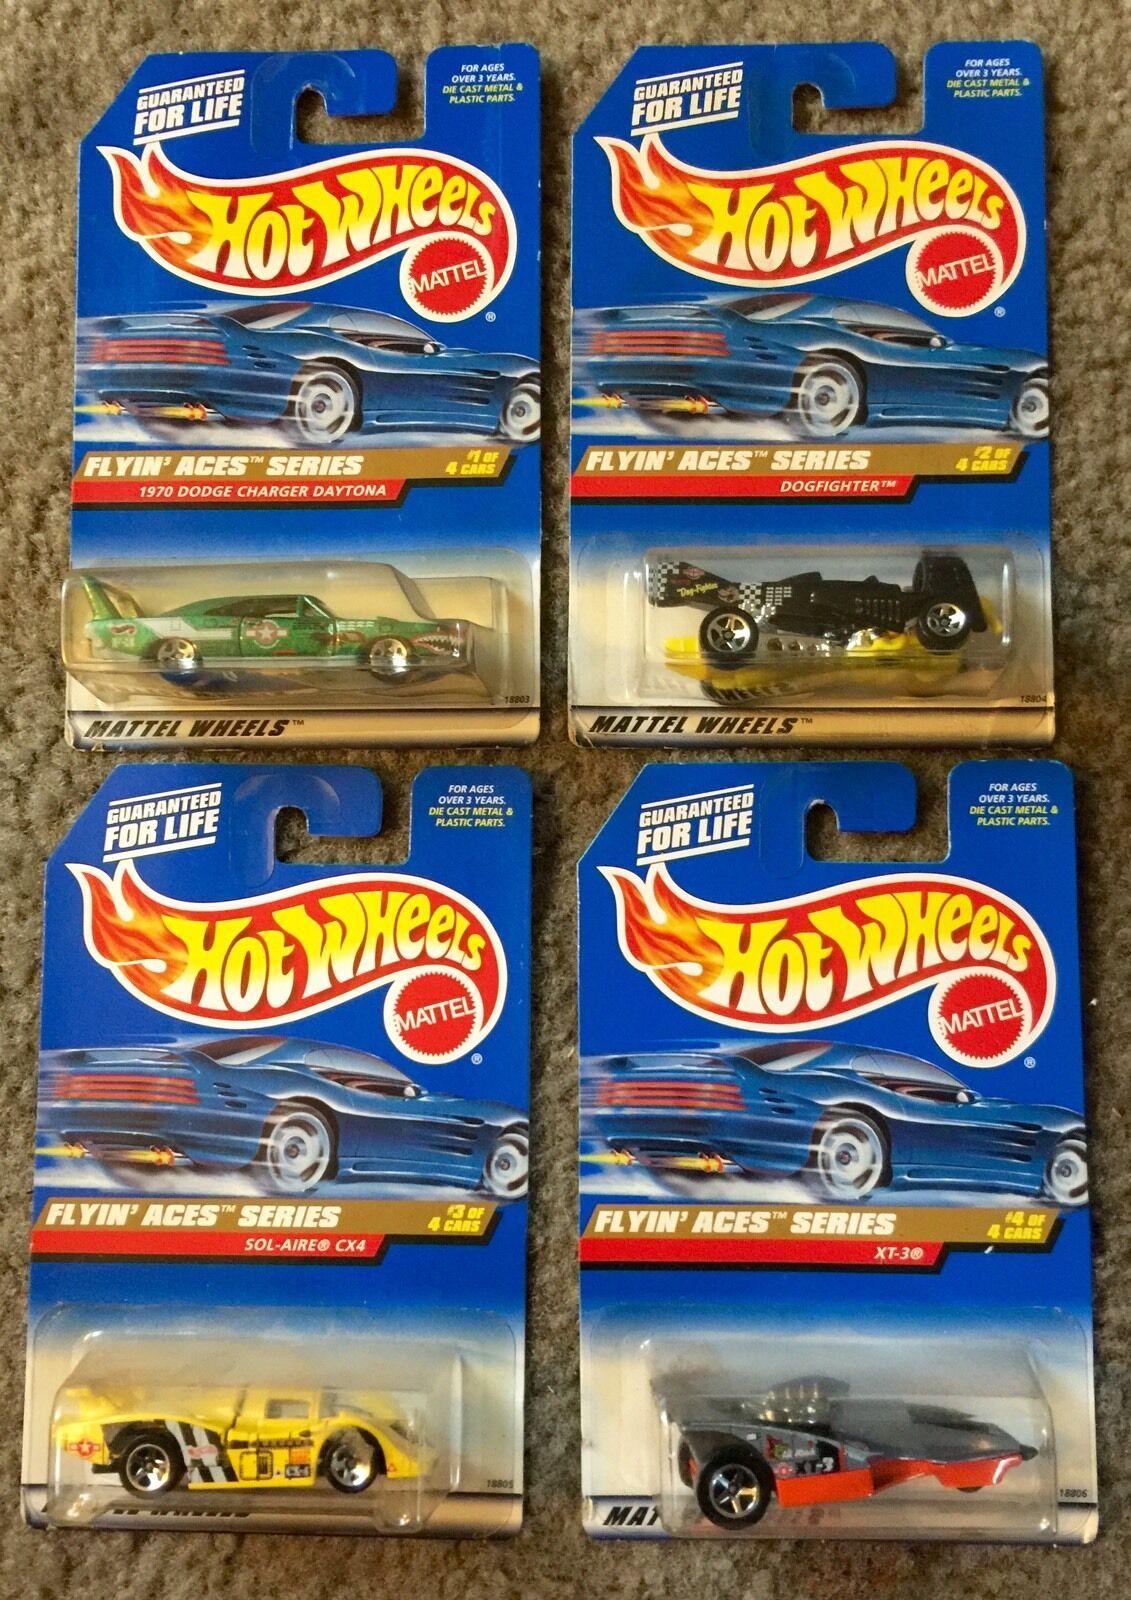 FLYIN ACES SERIES 1997 Hot Wheels- 4 Car Set